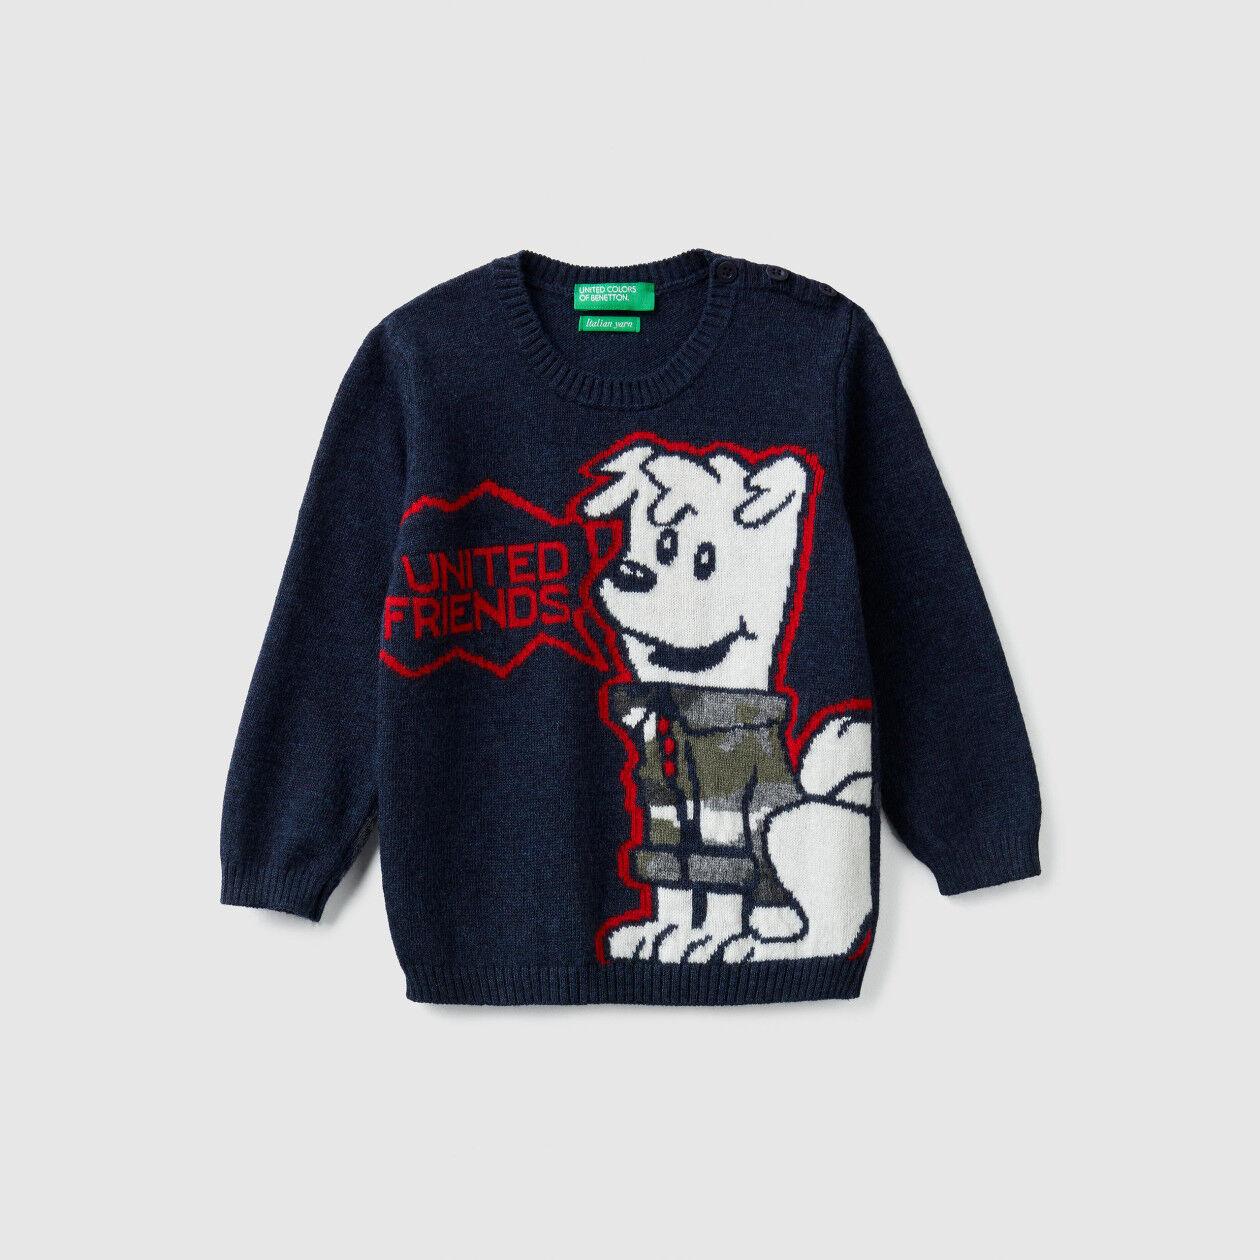 Camisola tricot com intársia